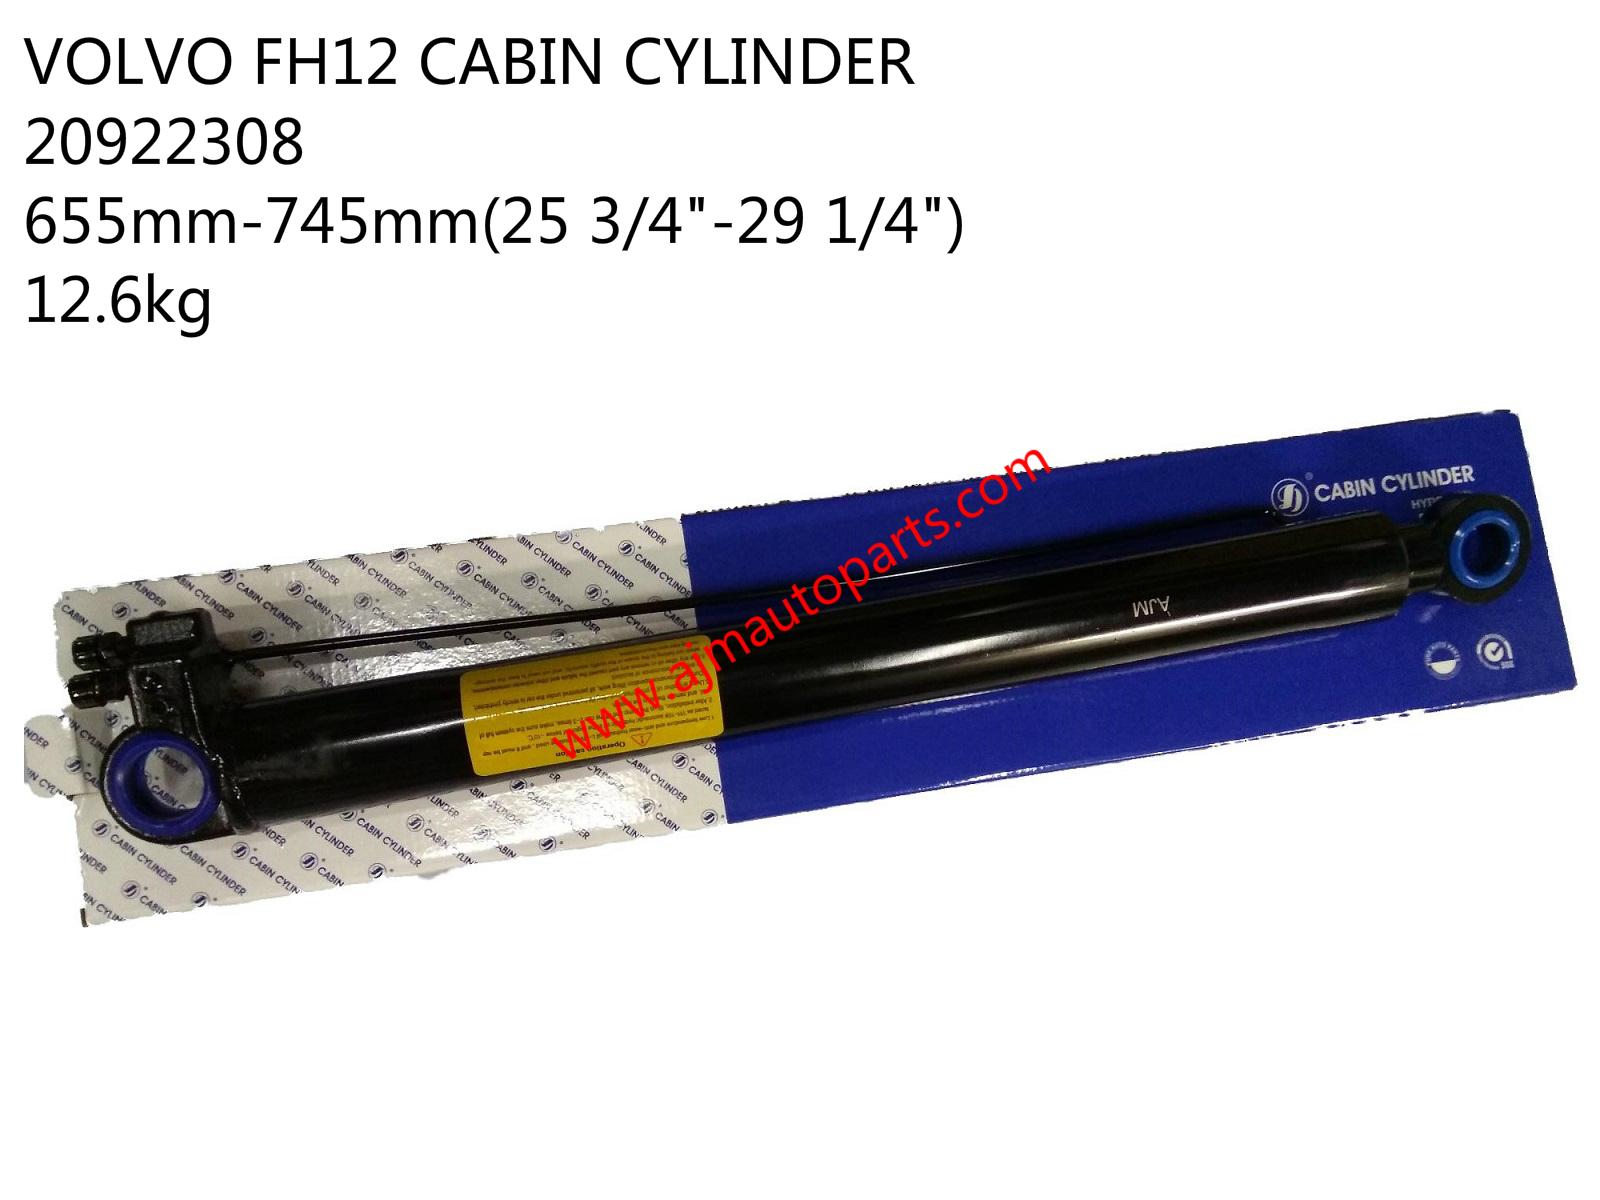 VOLVO_FH12_CABIN_CYLINDER-20922308